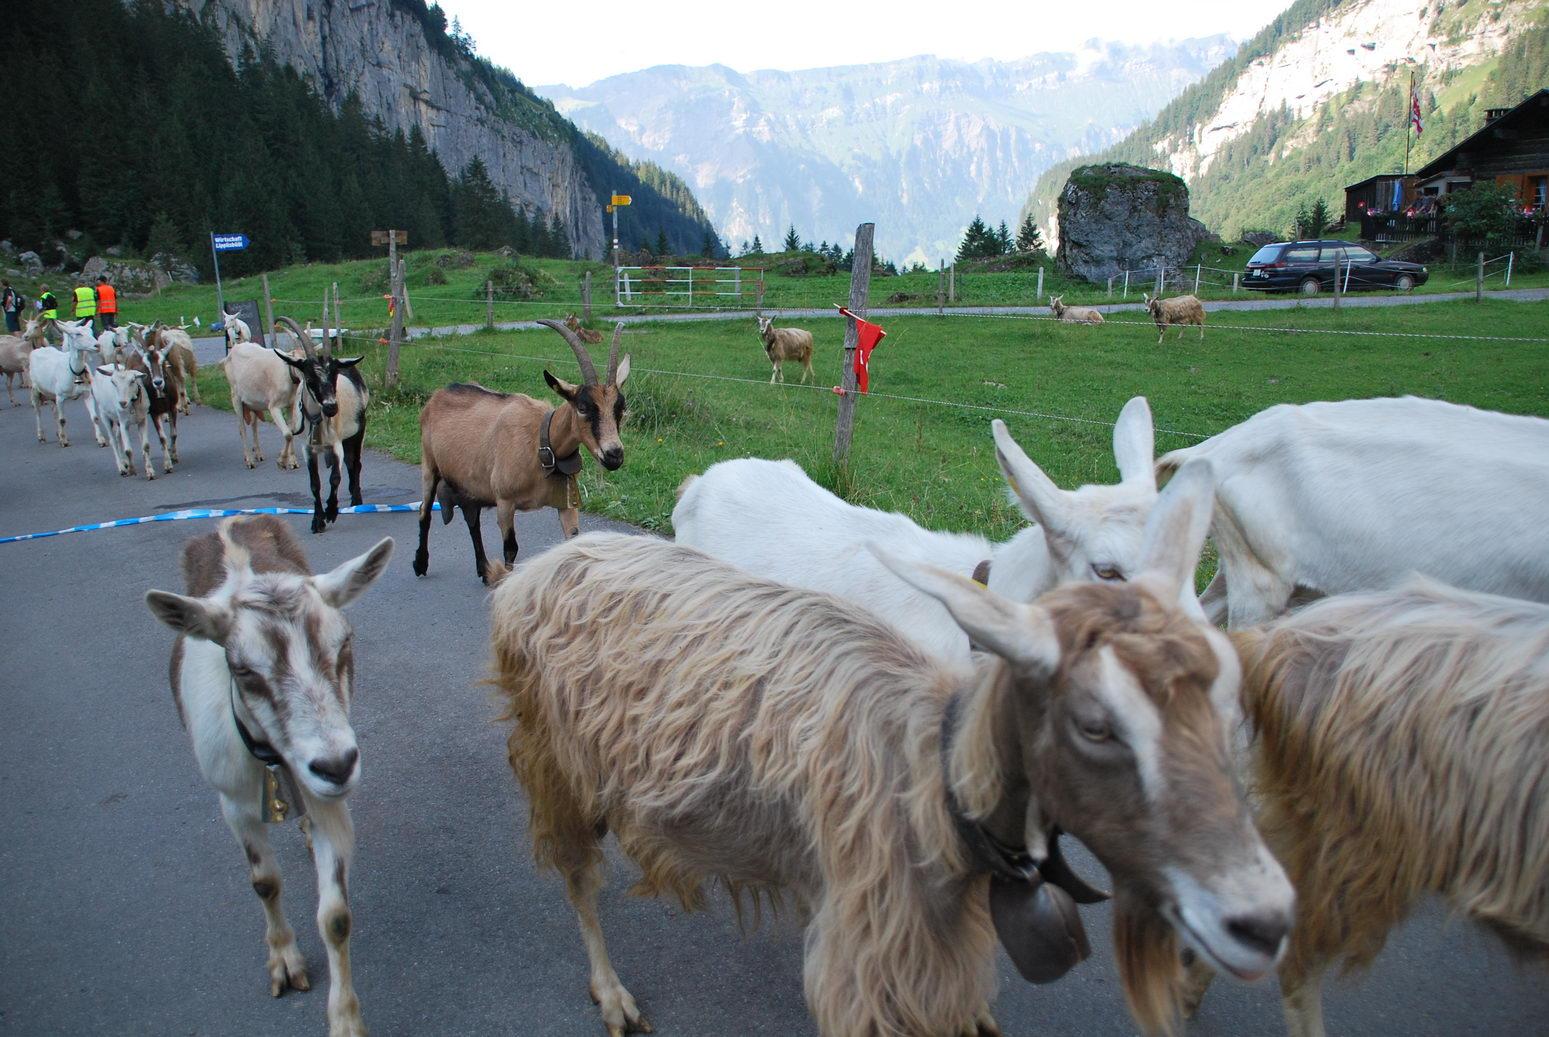 Sheep (Swiss O Week, Switzerland)